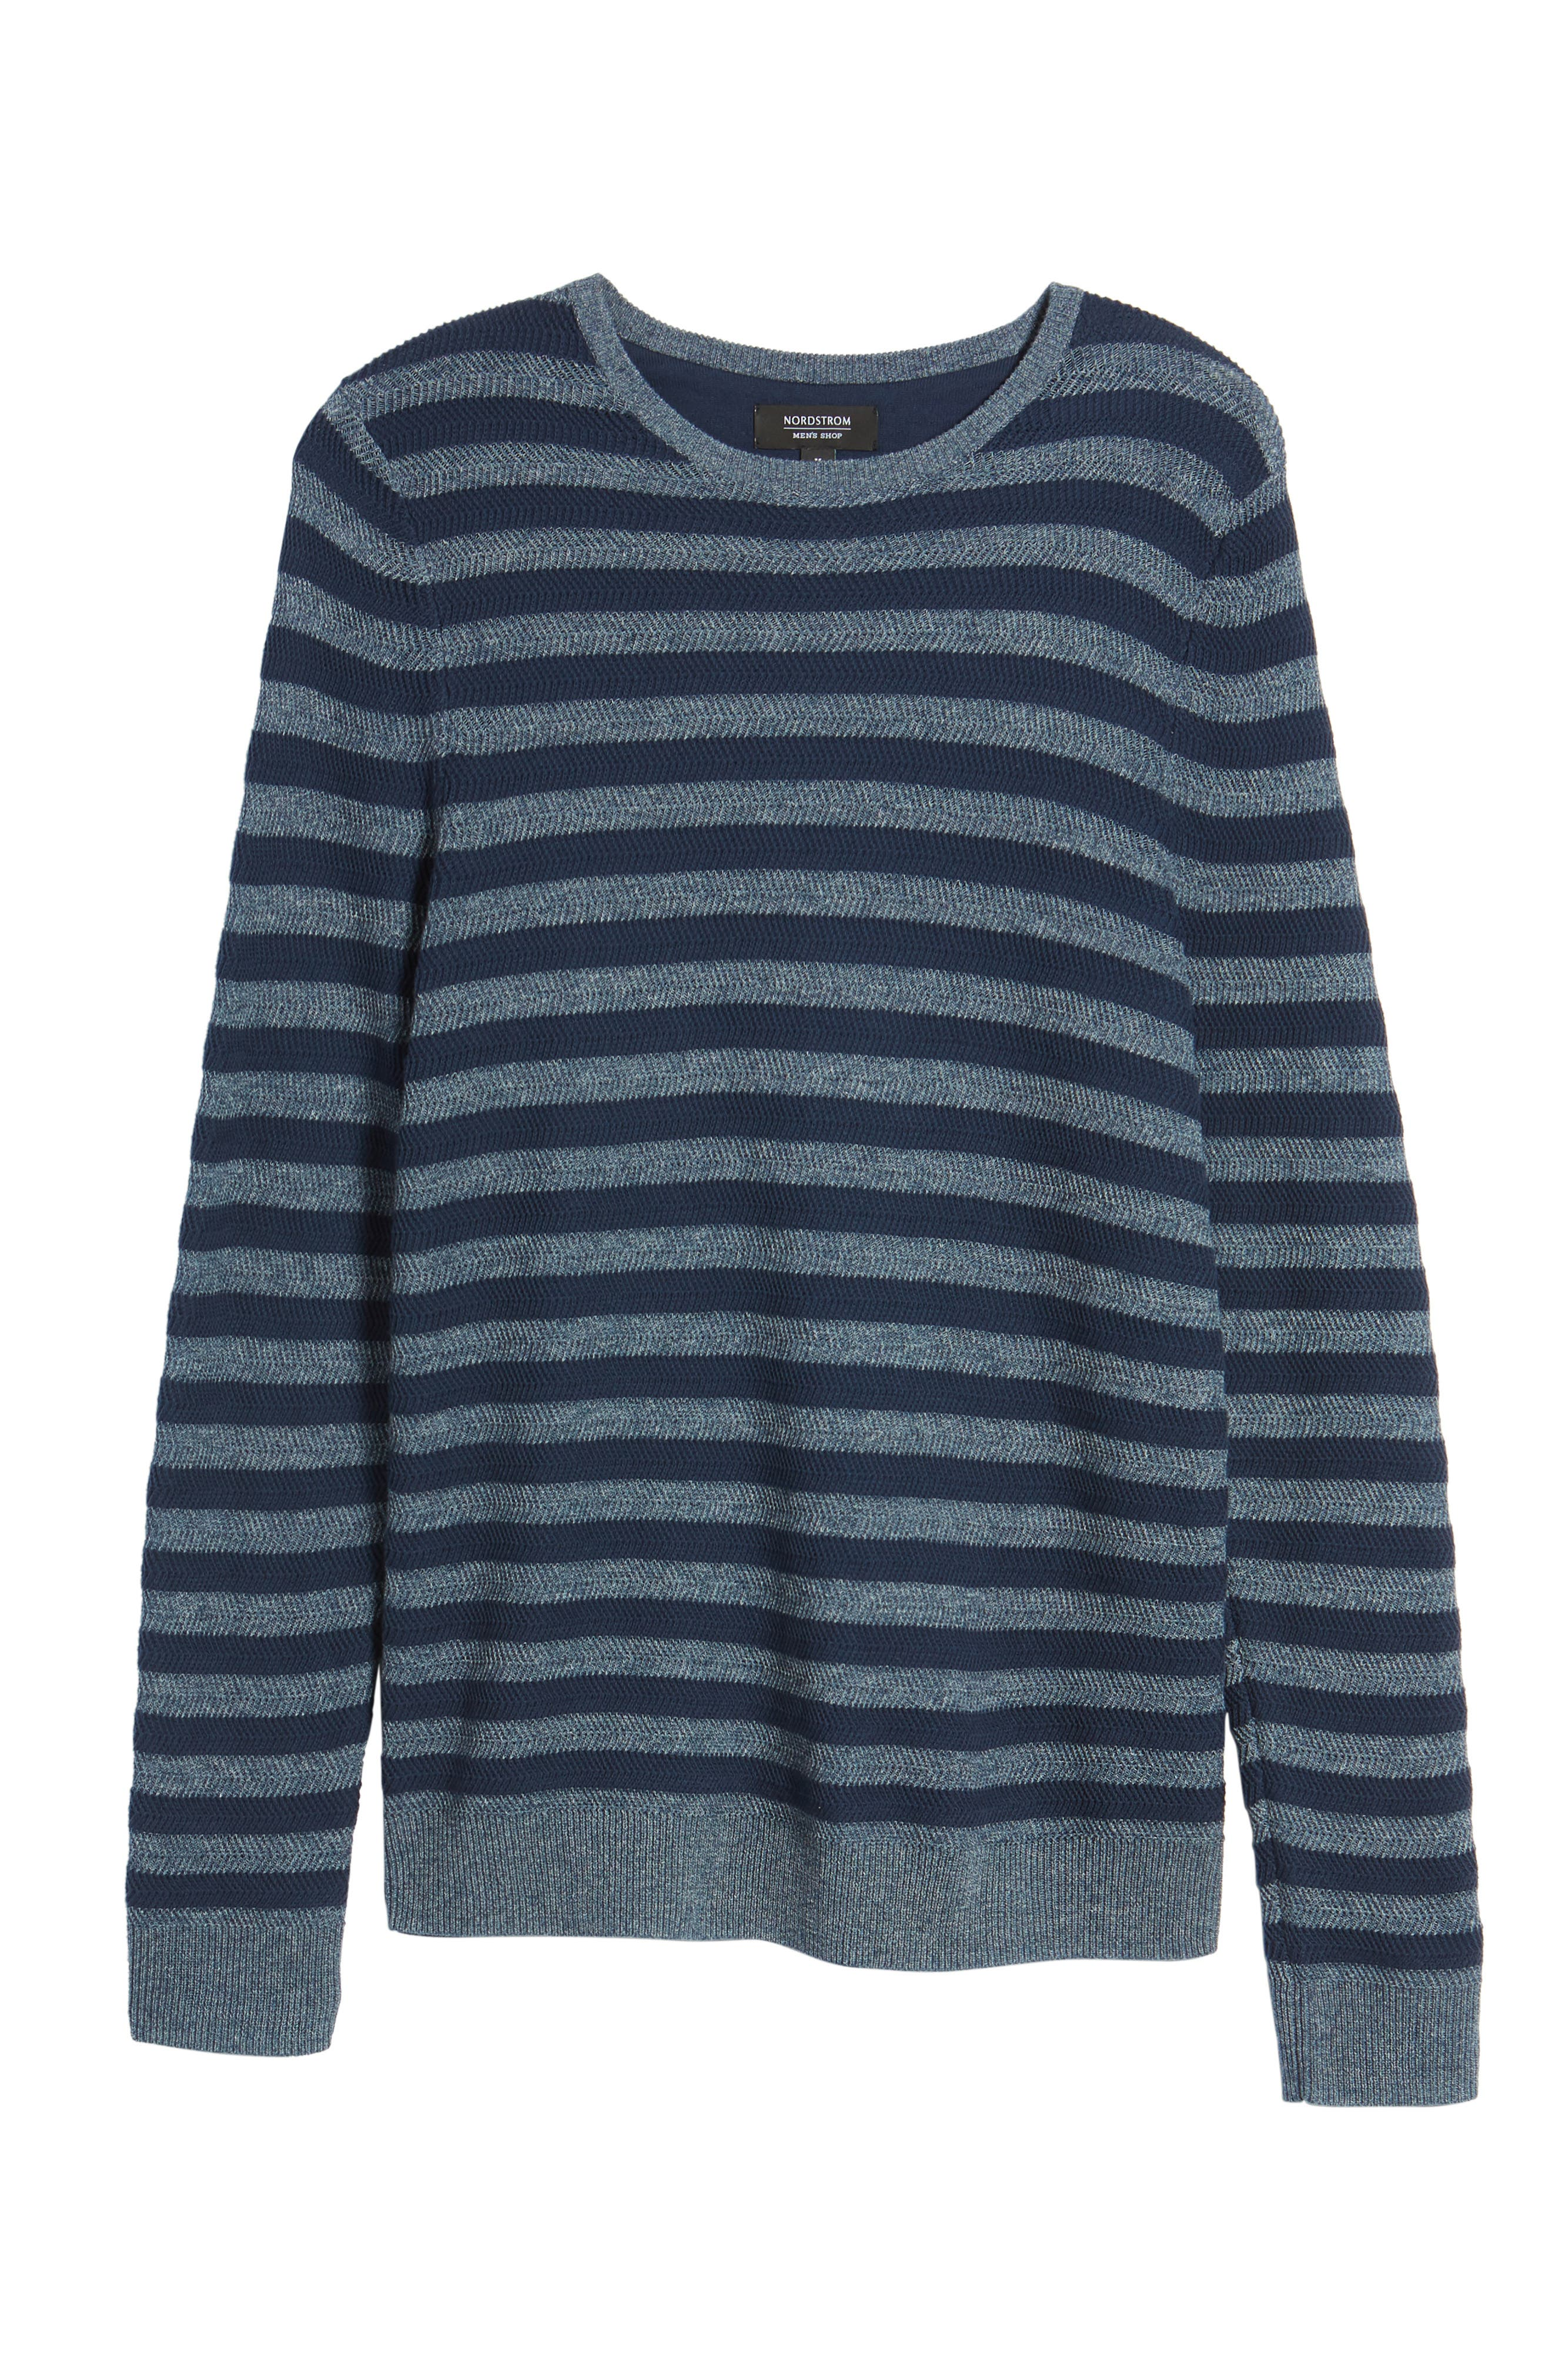 Stripe Cotton Blend Sweater,                             Alternate thumbnail 6, color,                             Navy Iris Stripe